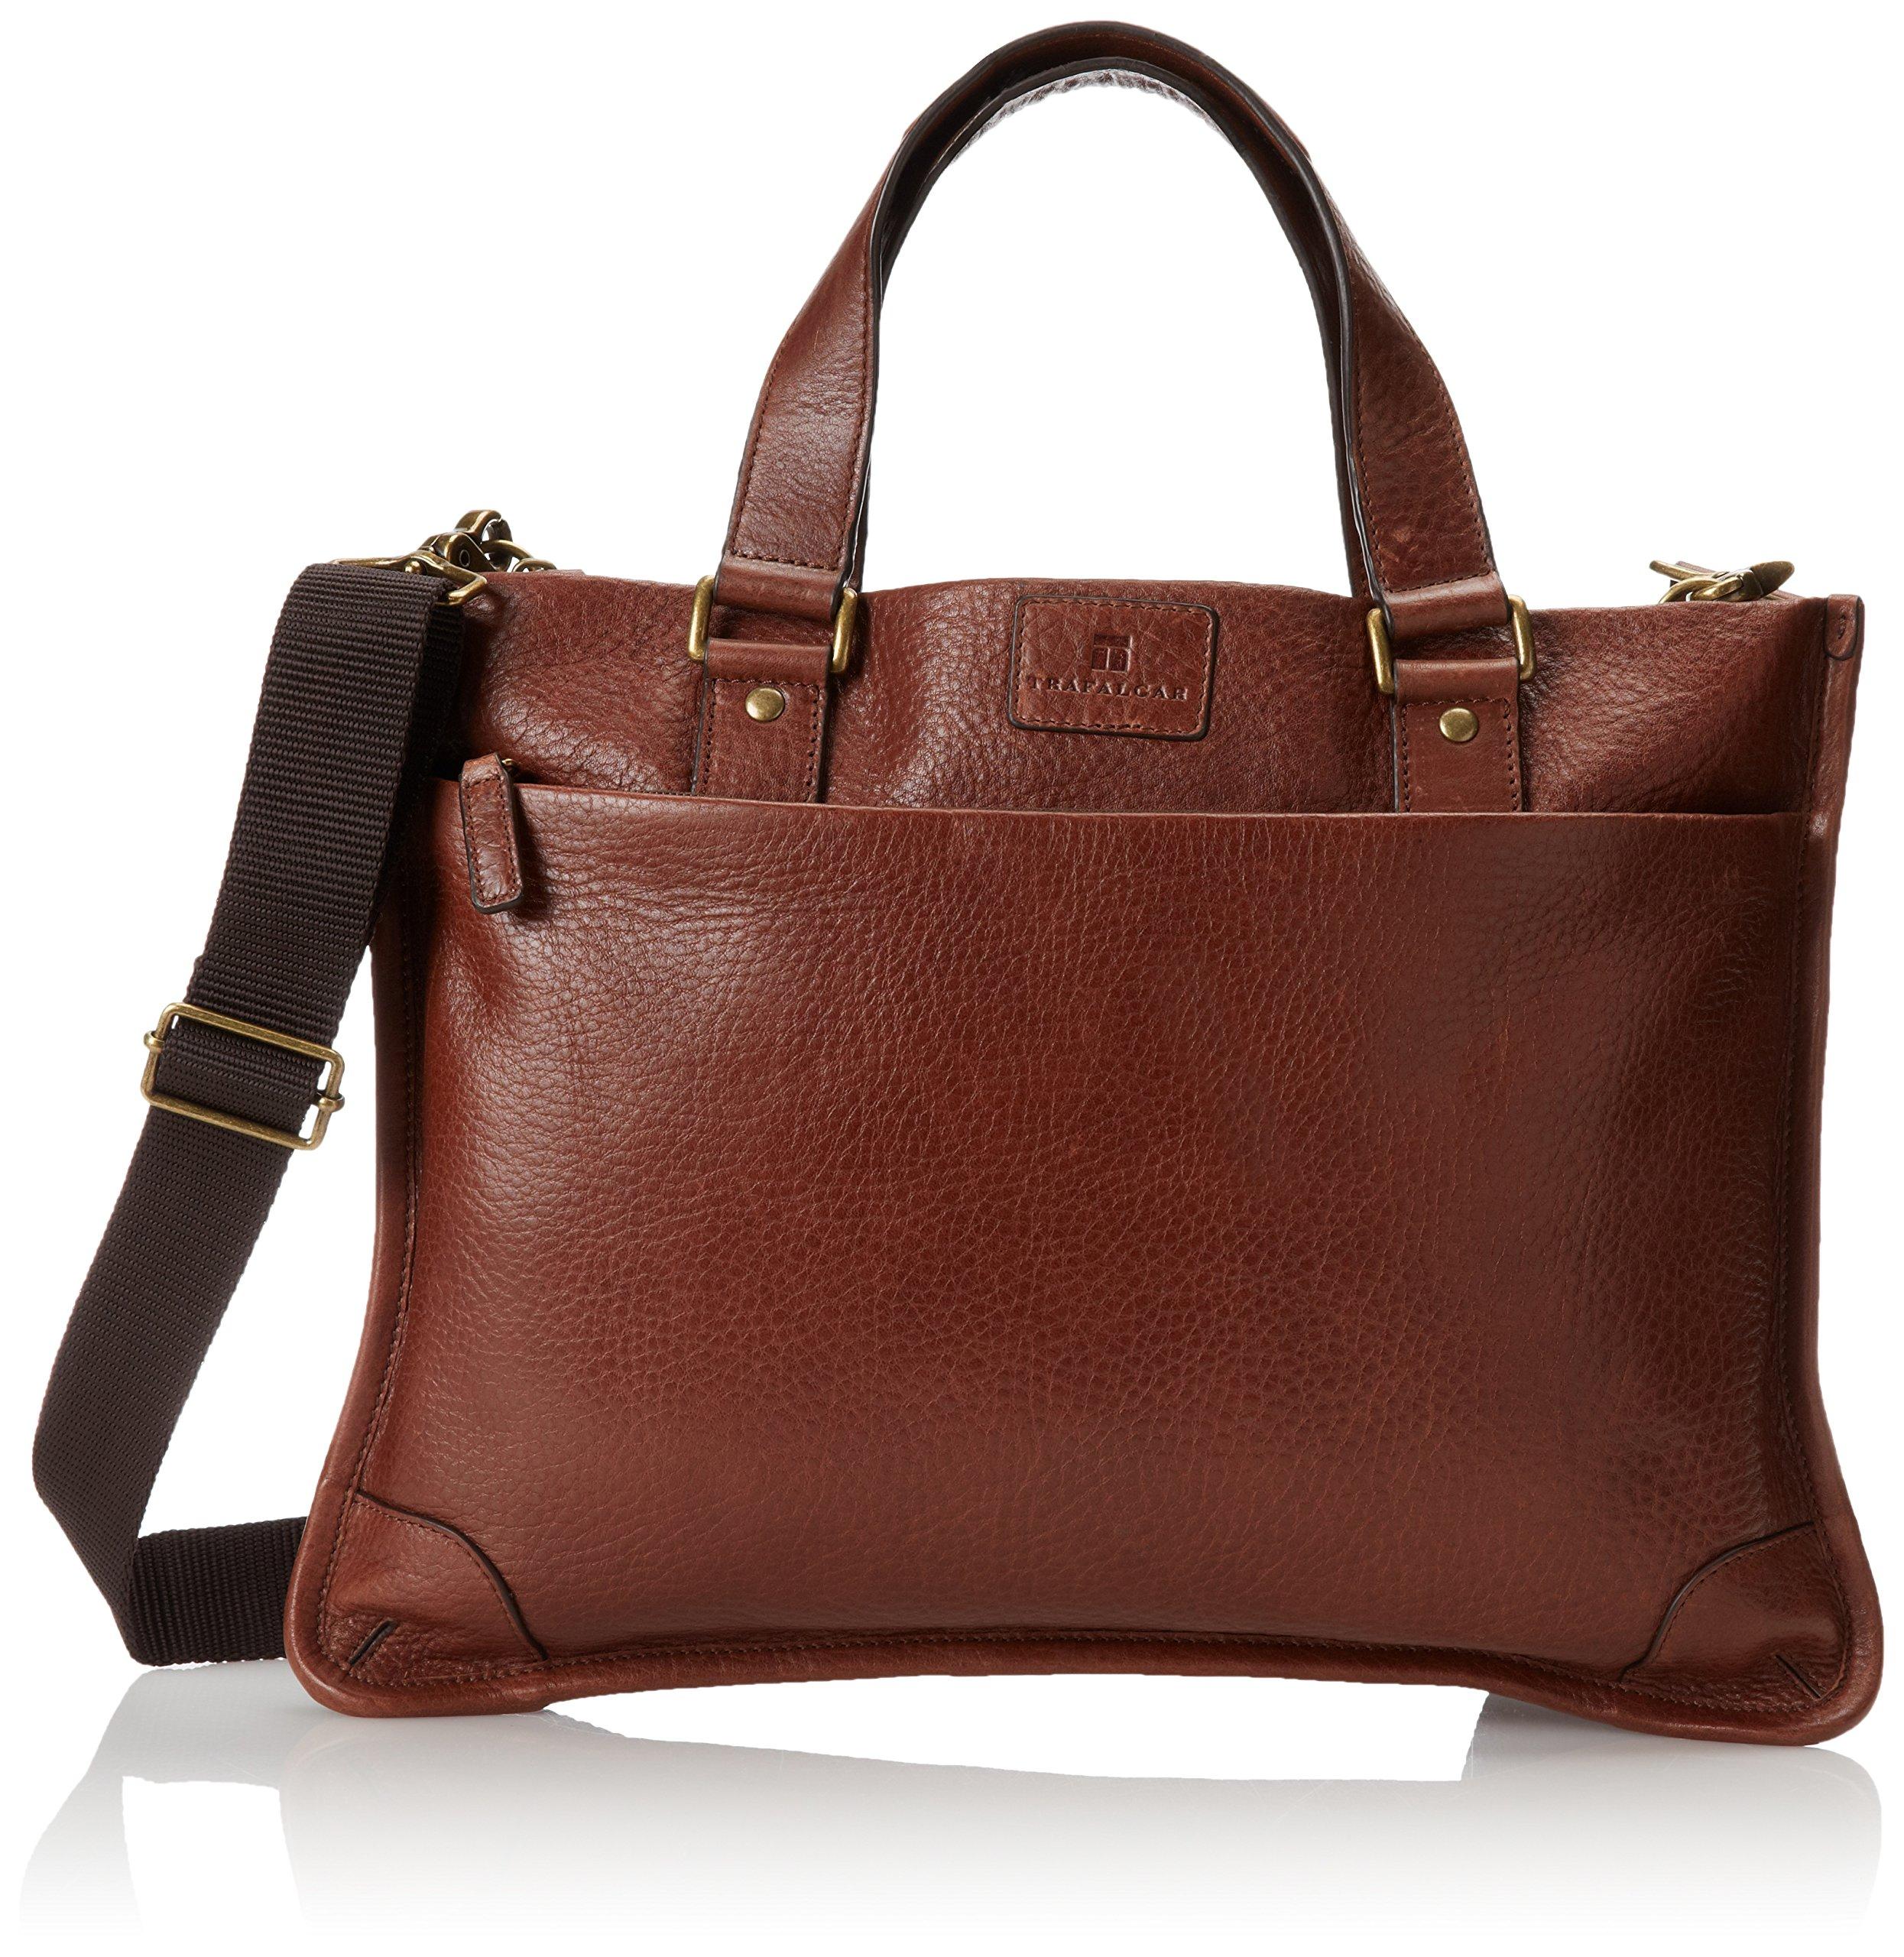 Trafalgar Men's Murray Hill Slim Brief Bag, Brown, One Size